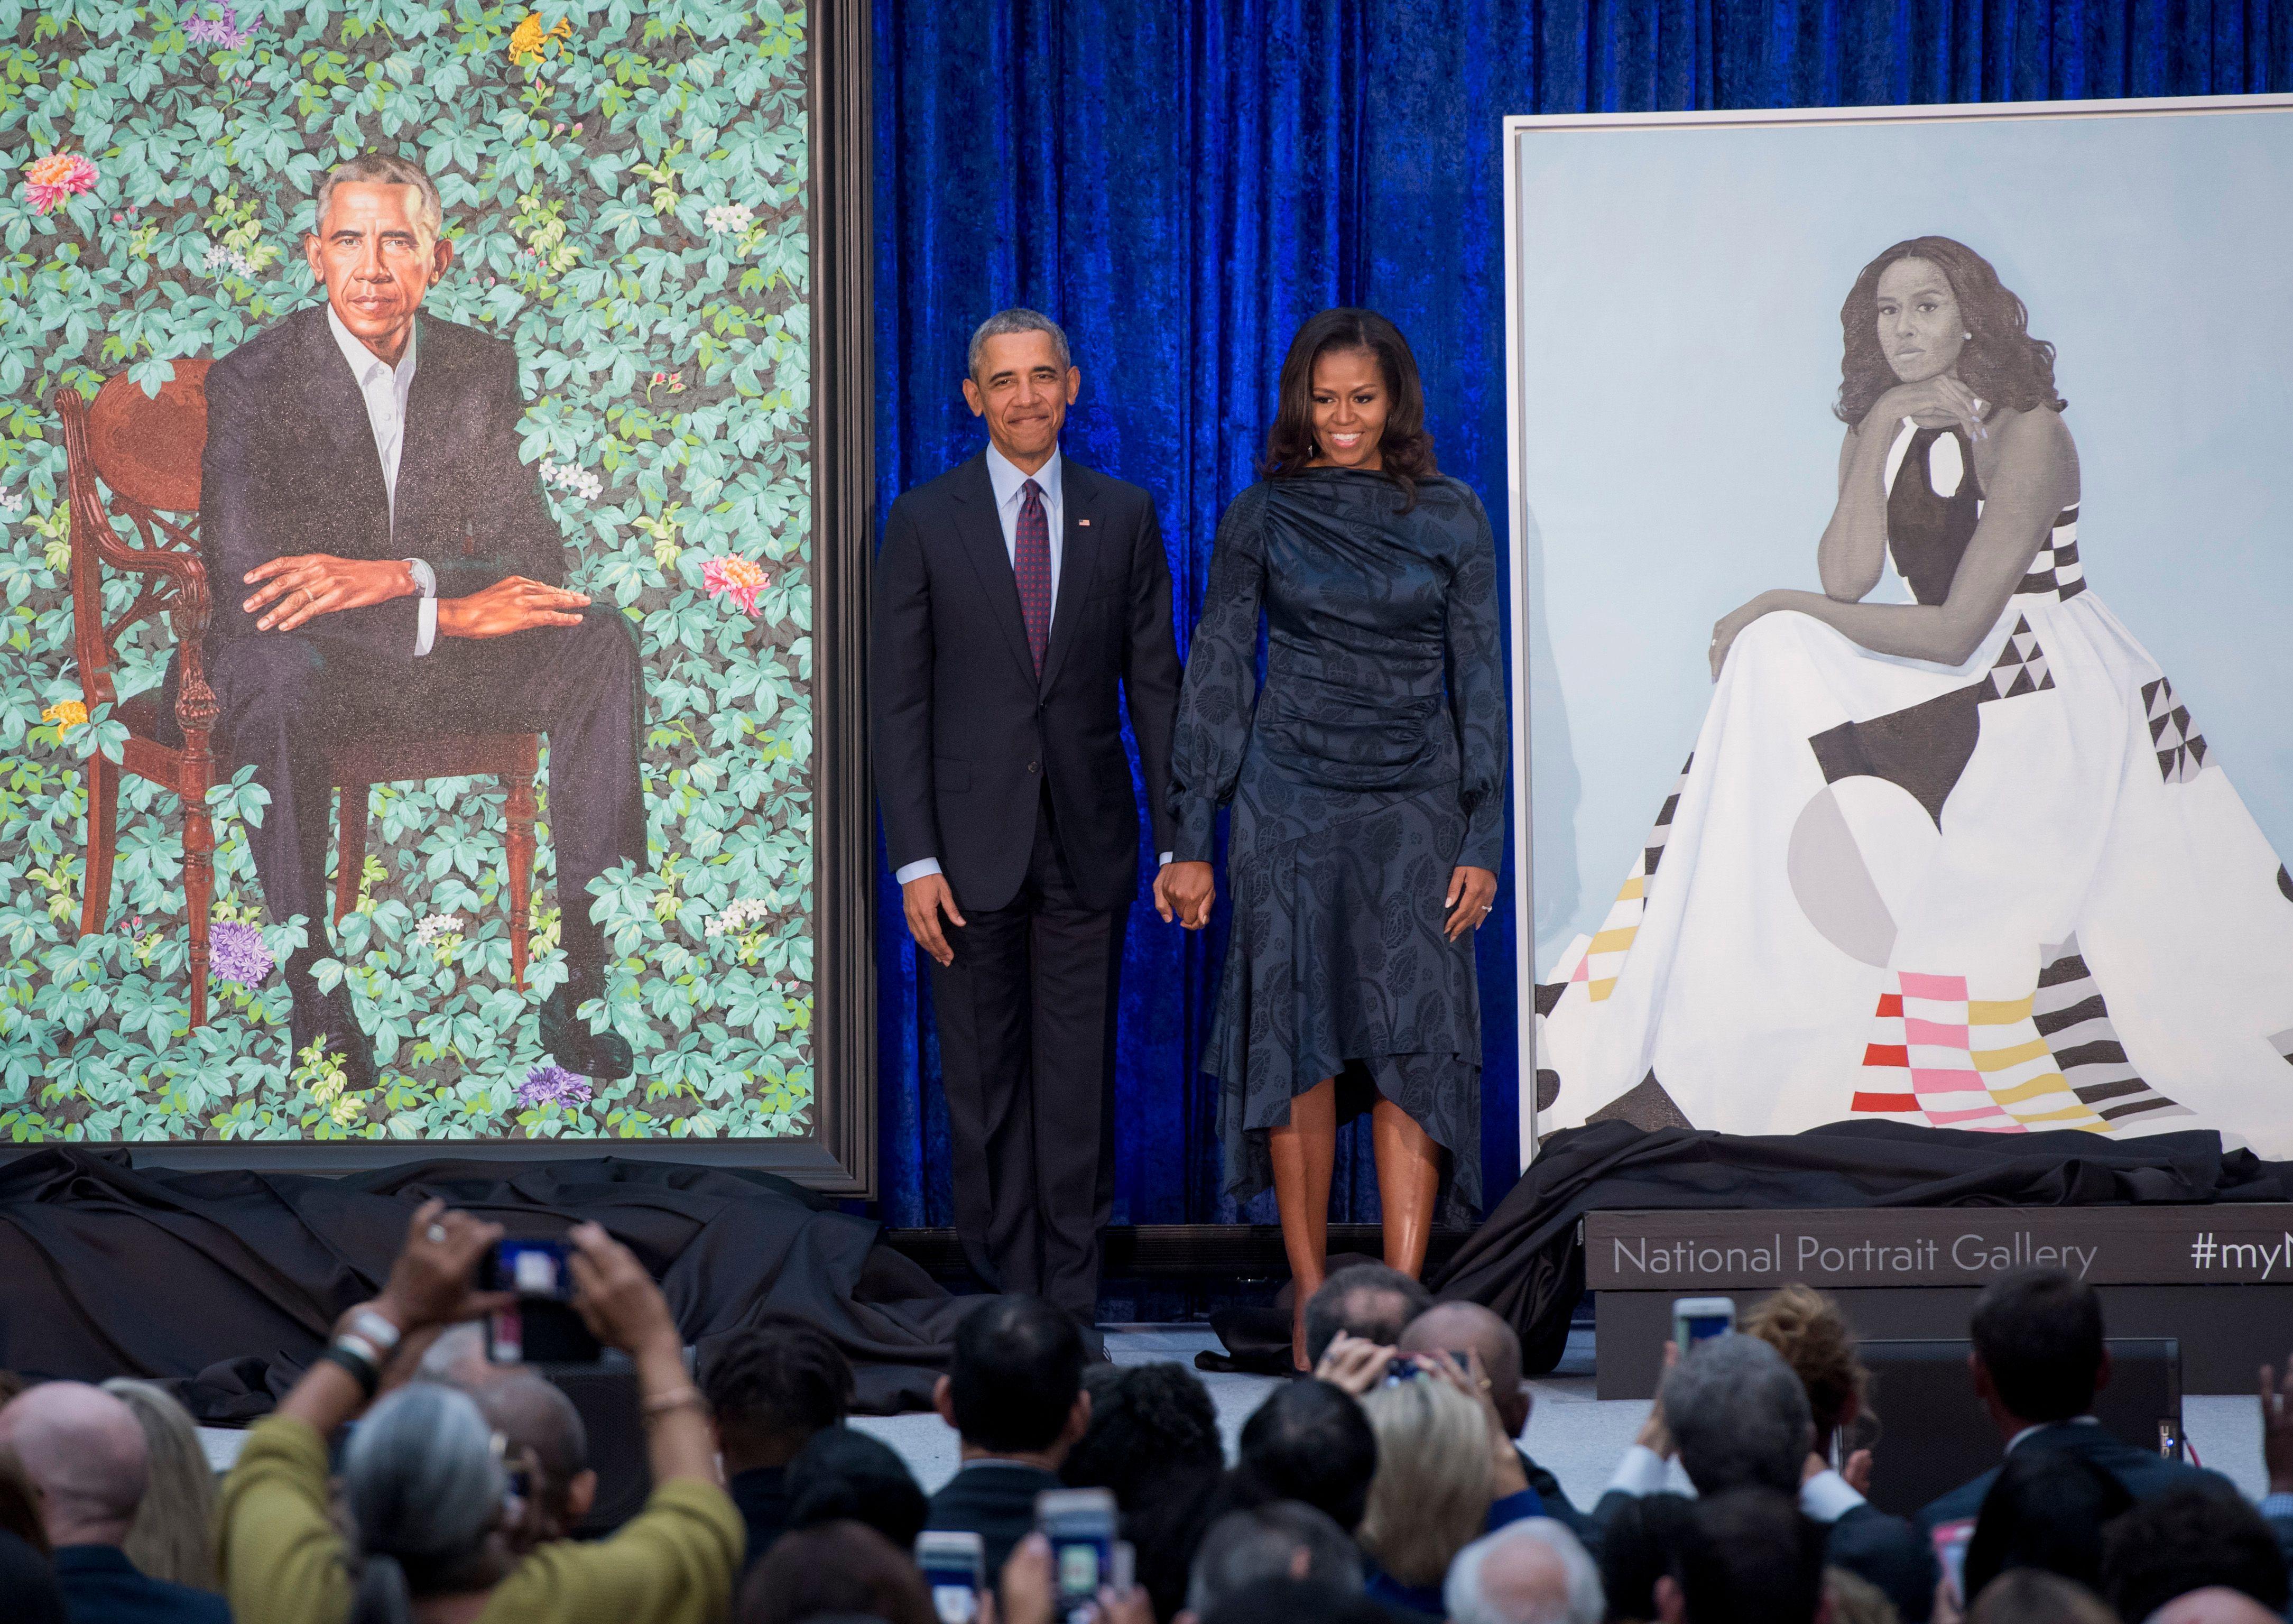 US-POLITICS-ART-HERITAGE-OBAMA